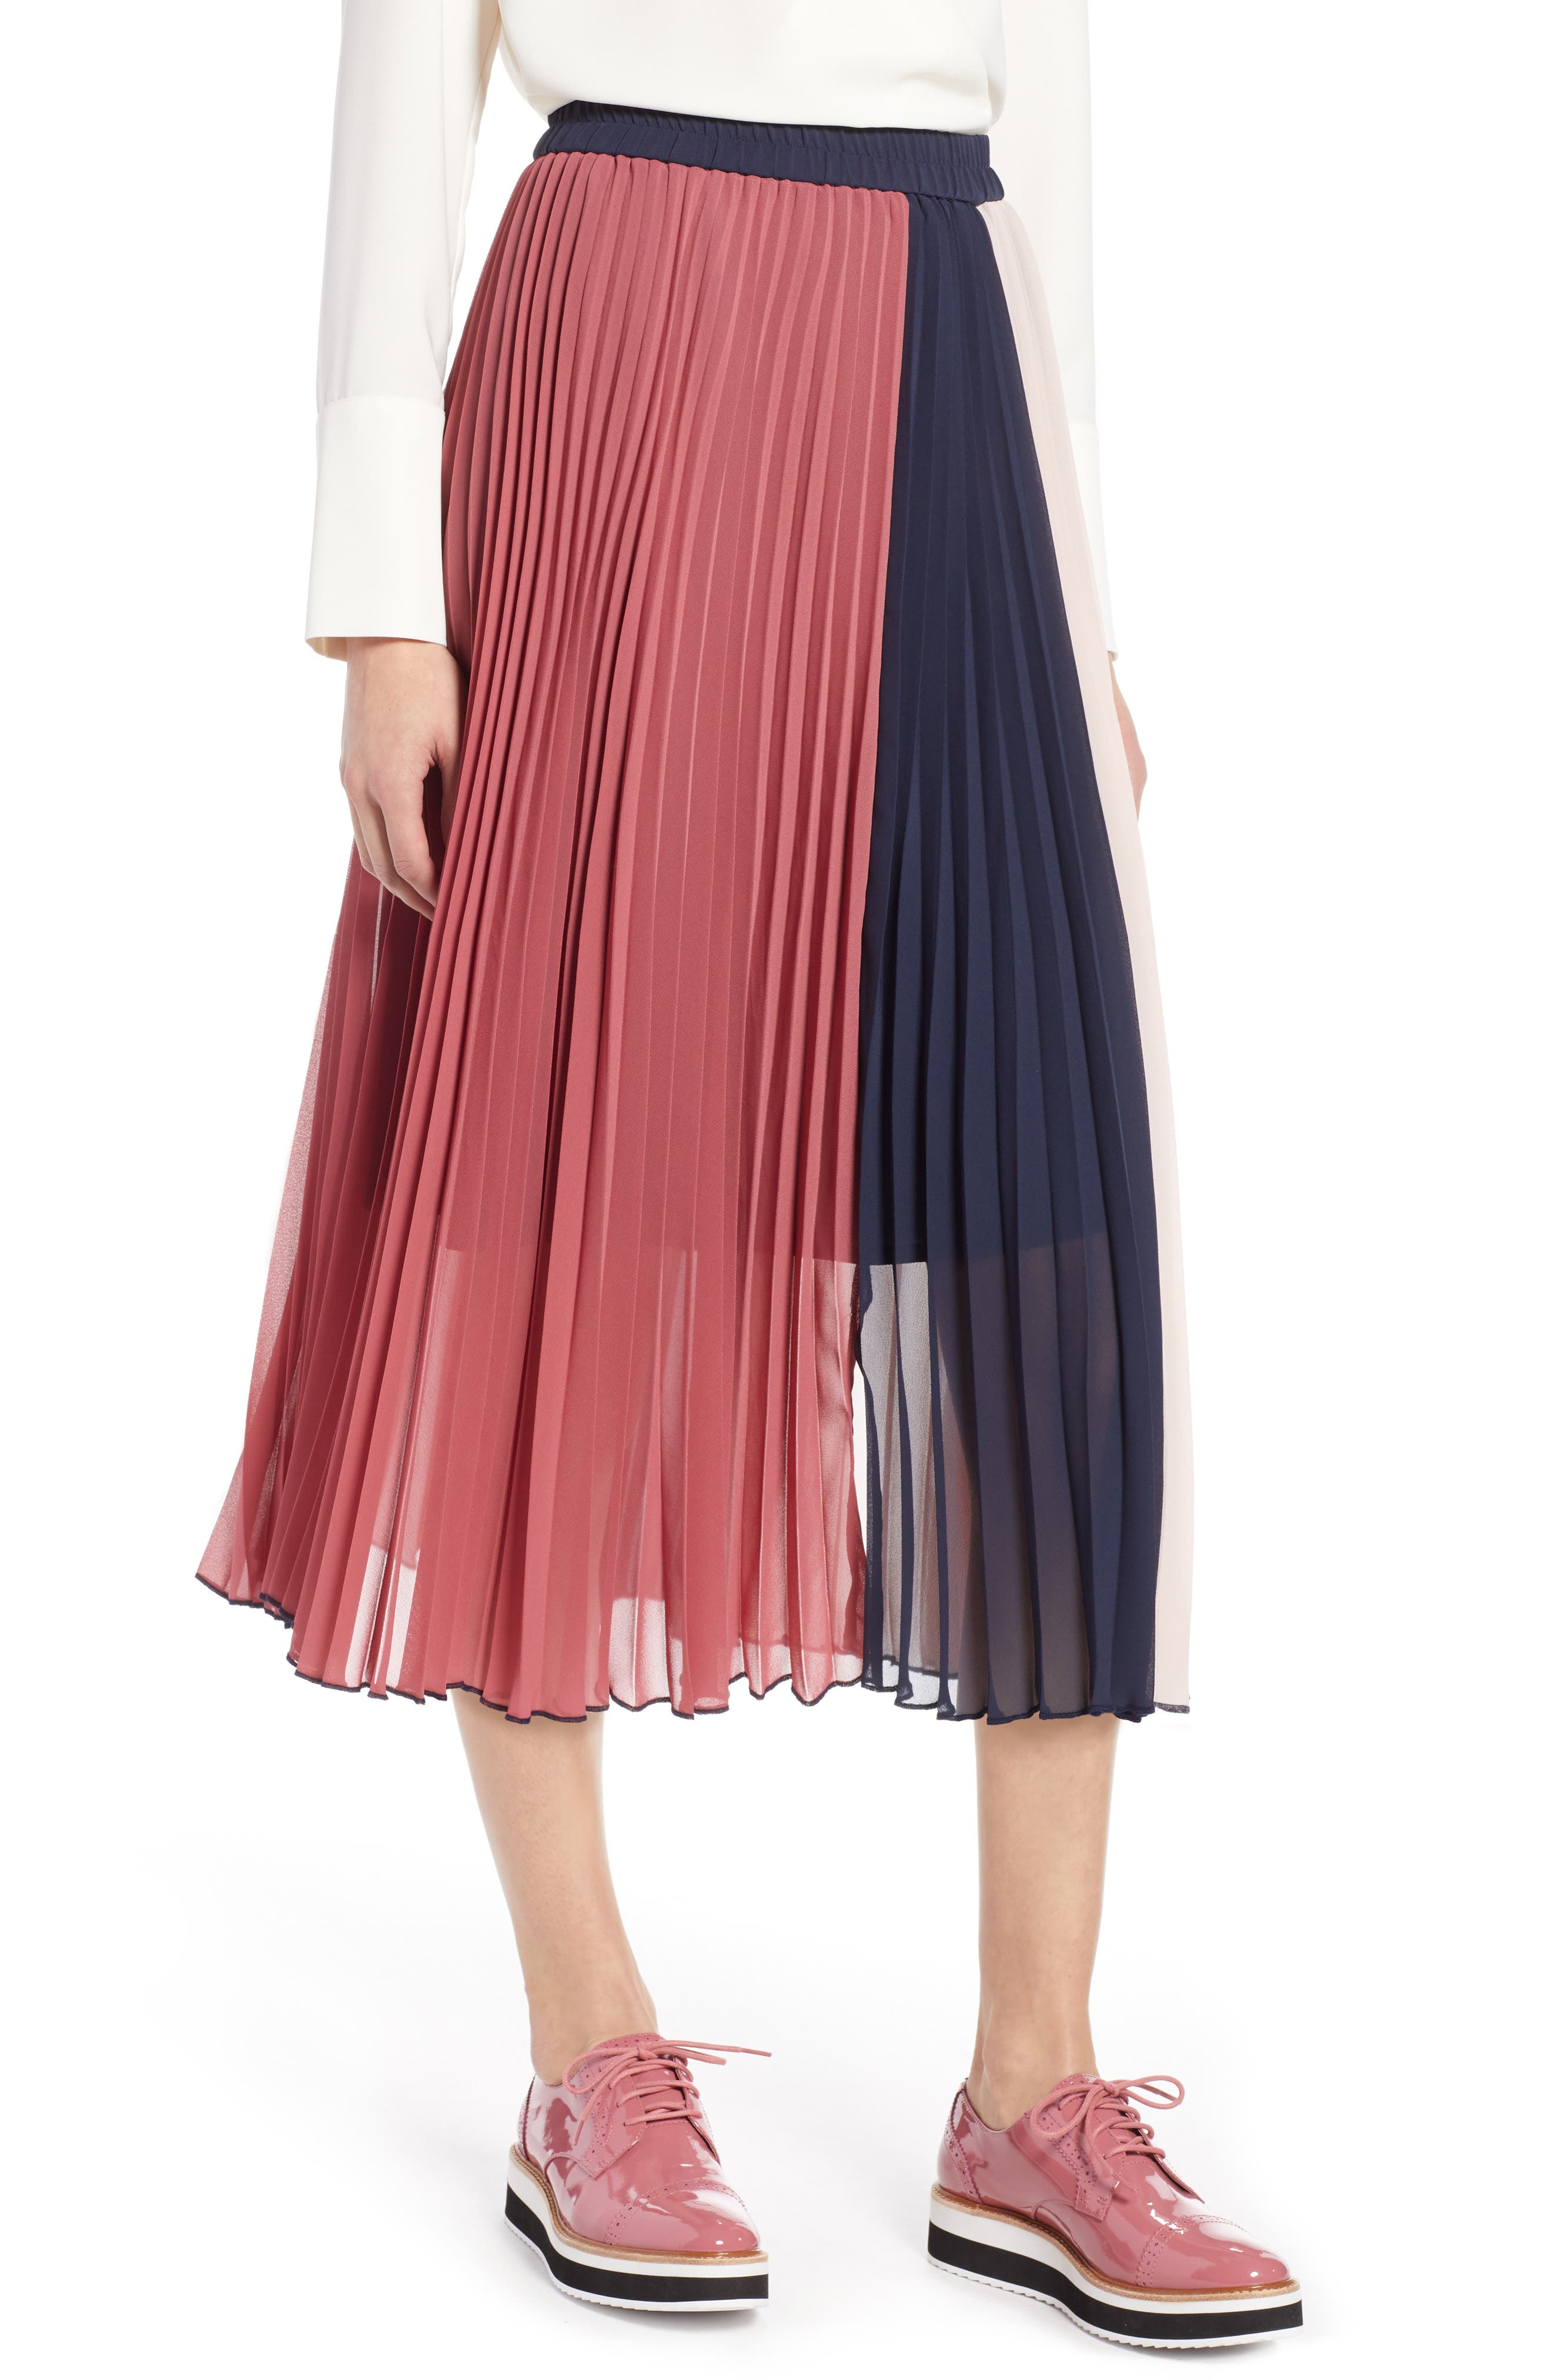 x Atlantic-Pacific Colorblock Pleated Midi Skirt,                             Main thumbnail 1, color,                             PINK- NAVY COLORBLOCK